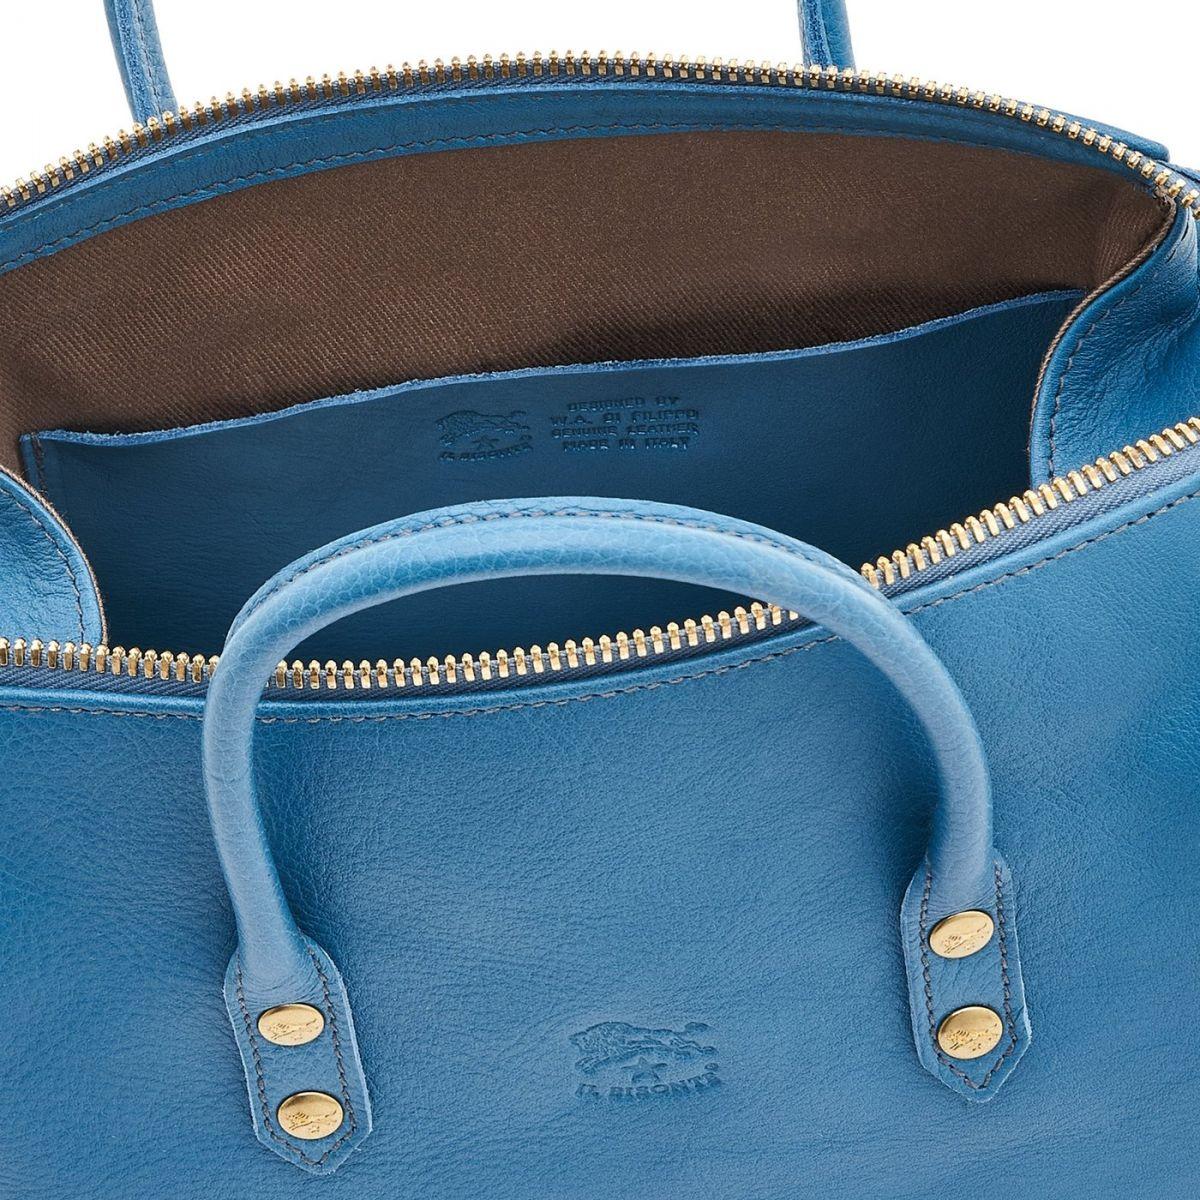 Women's Handbag in Cowhide Leather color Blue Teal - Pratolino line BTH049 | Details